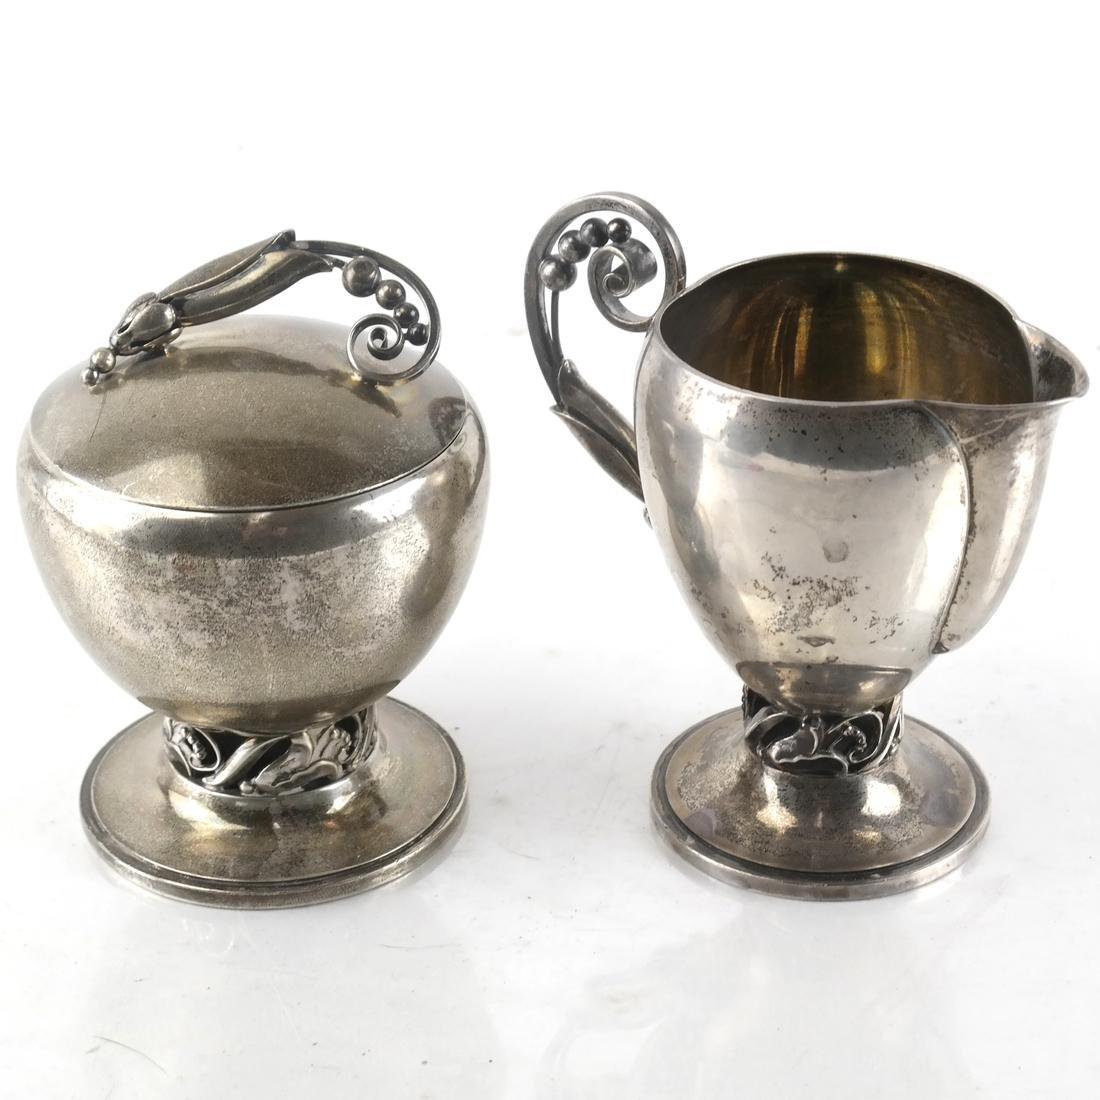 Georg Jensen, Silver Sugar Bowl and Creamer